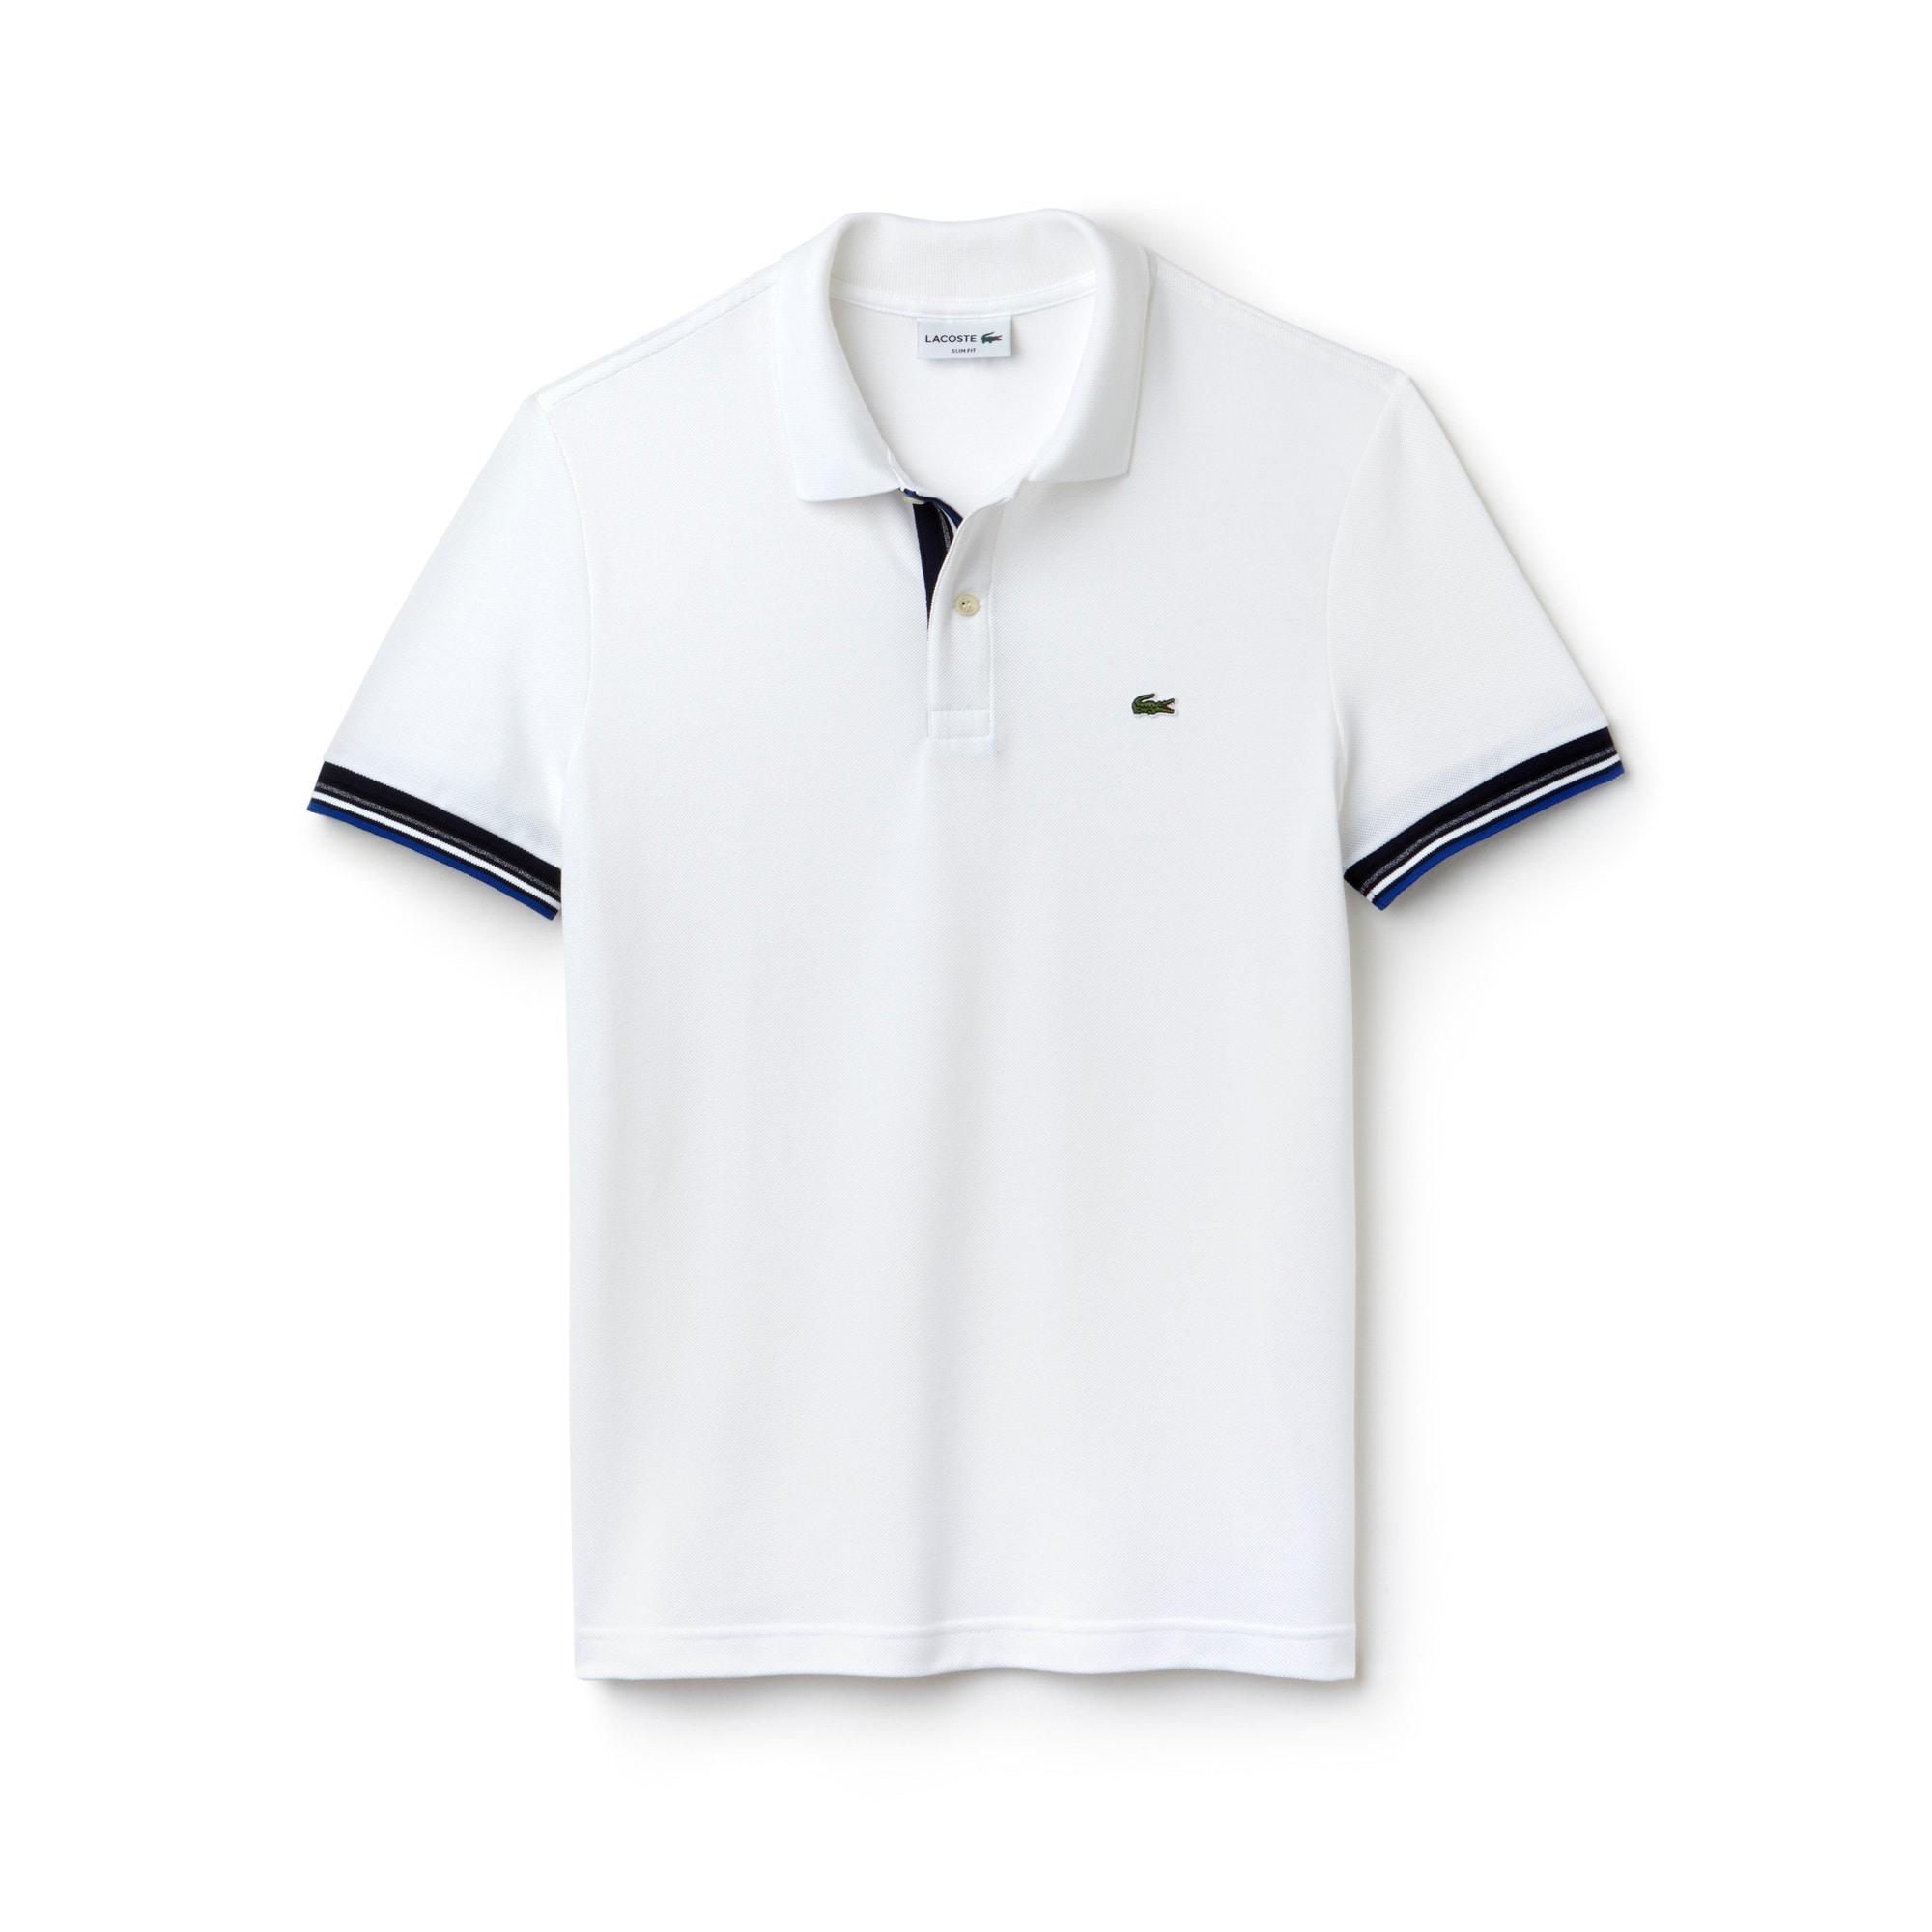 Men's Lacoste Slim Fit Piped Two-Ply Cotton Petit Piqué Polo